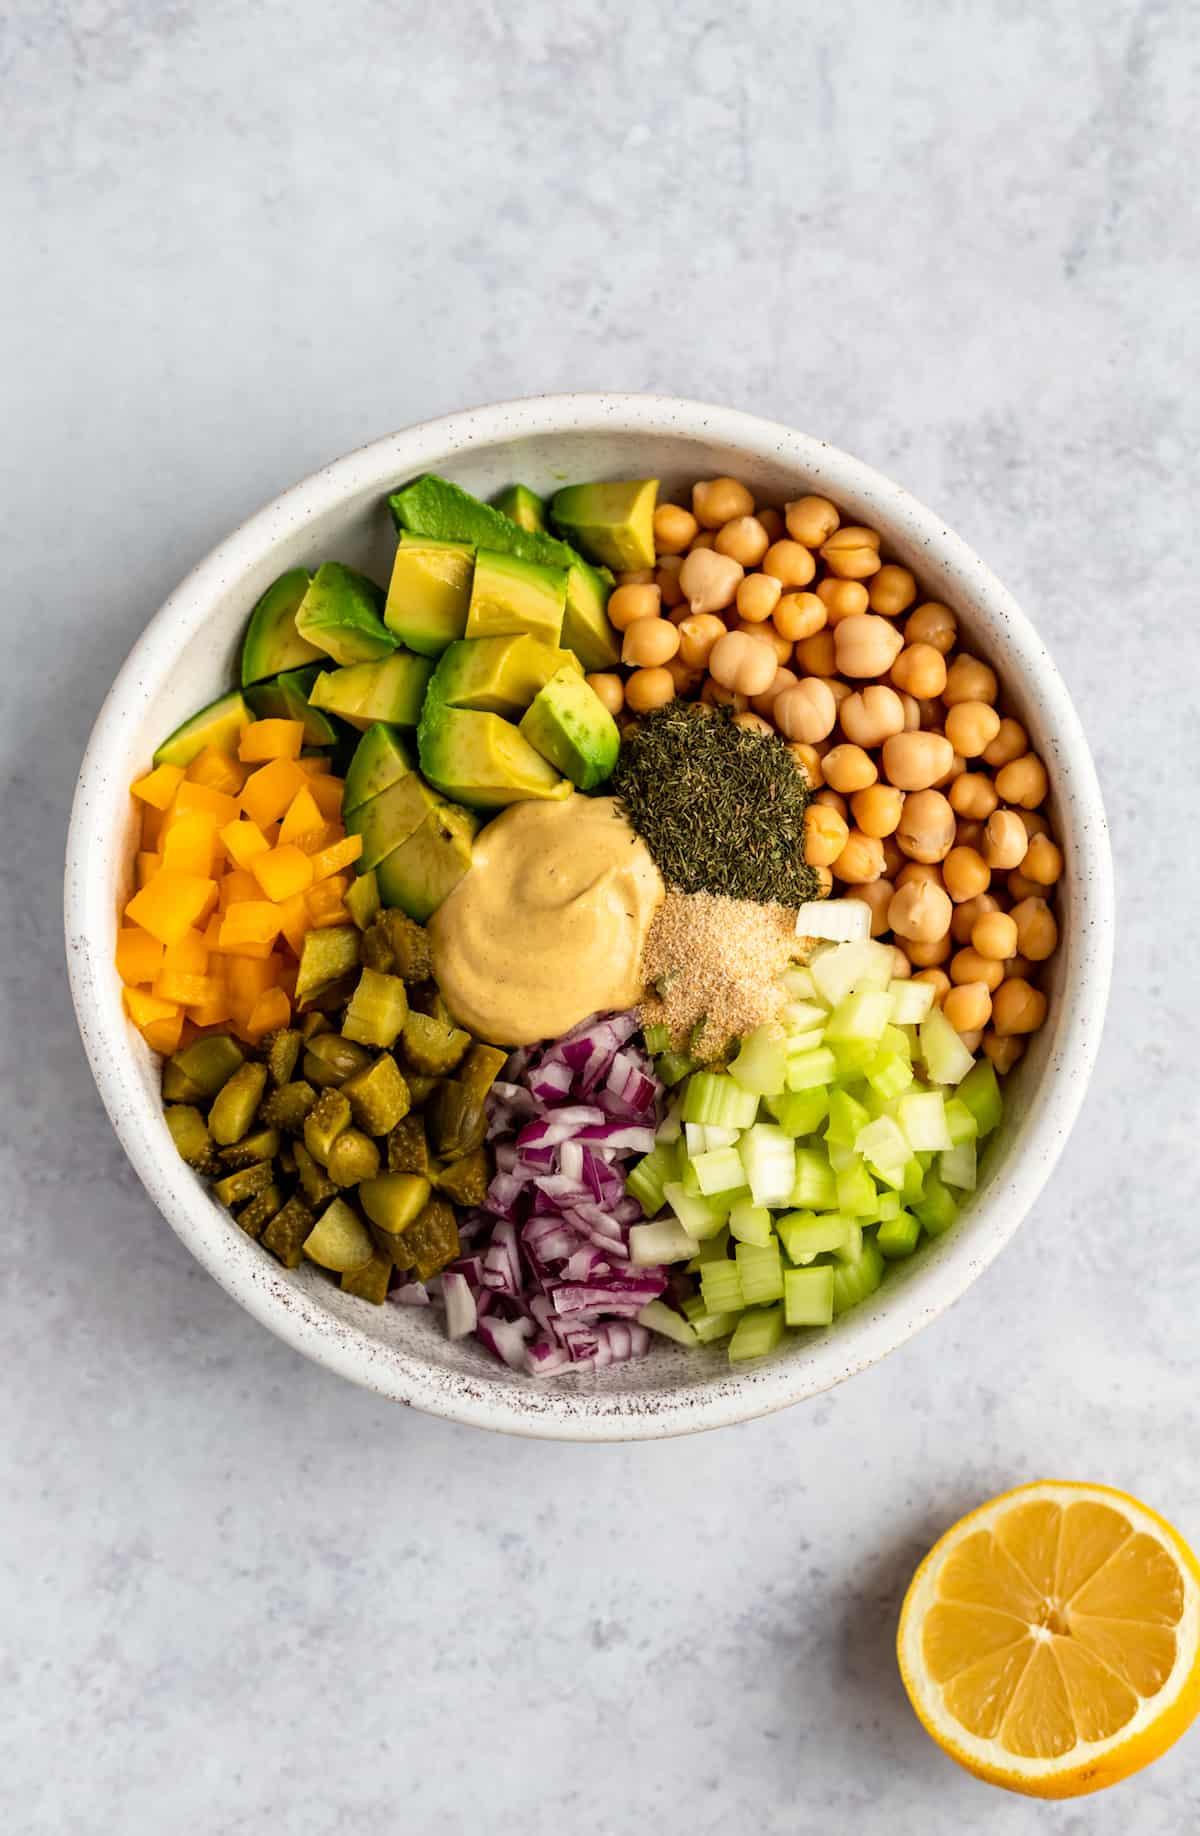 white bowl of vegetable ingredients